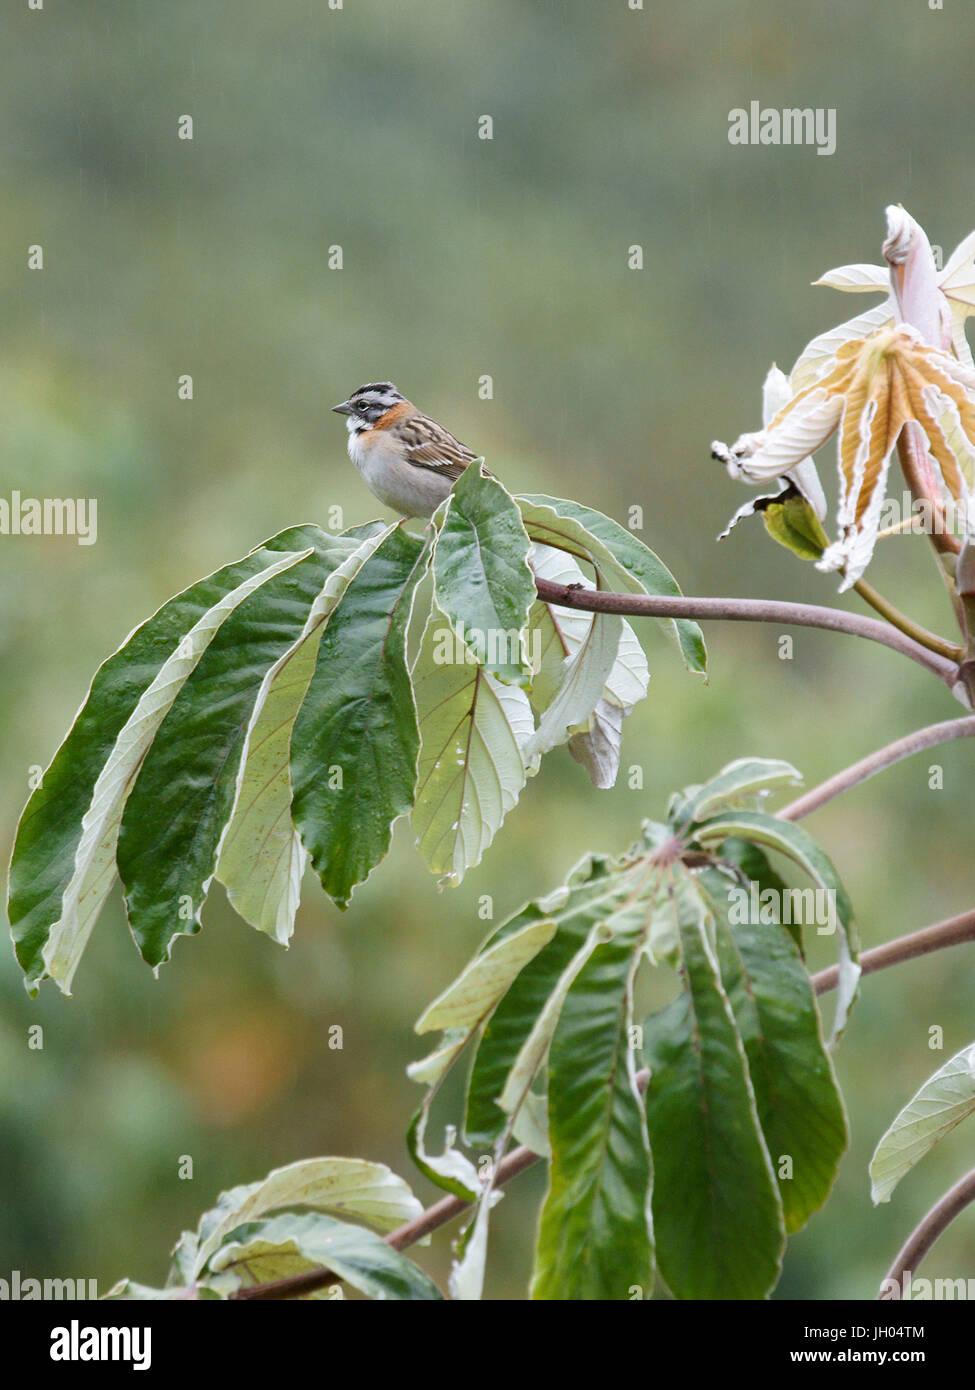 Bird, Tick-tick, Chapada Diamantina, Bahia, Brazil Stock Photo